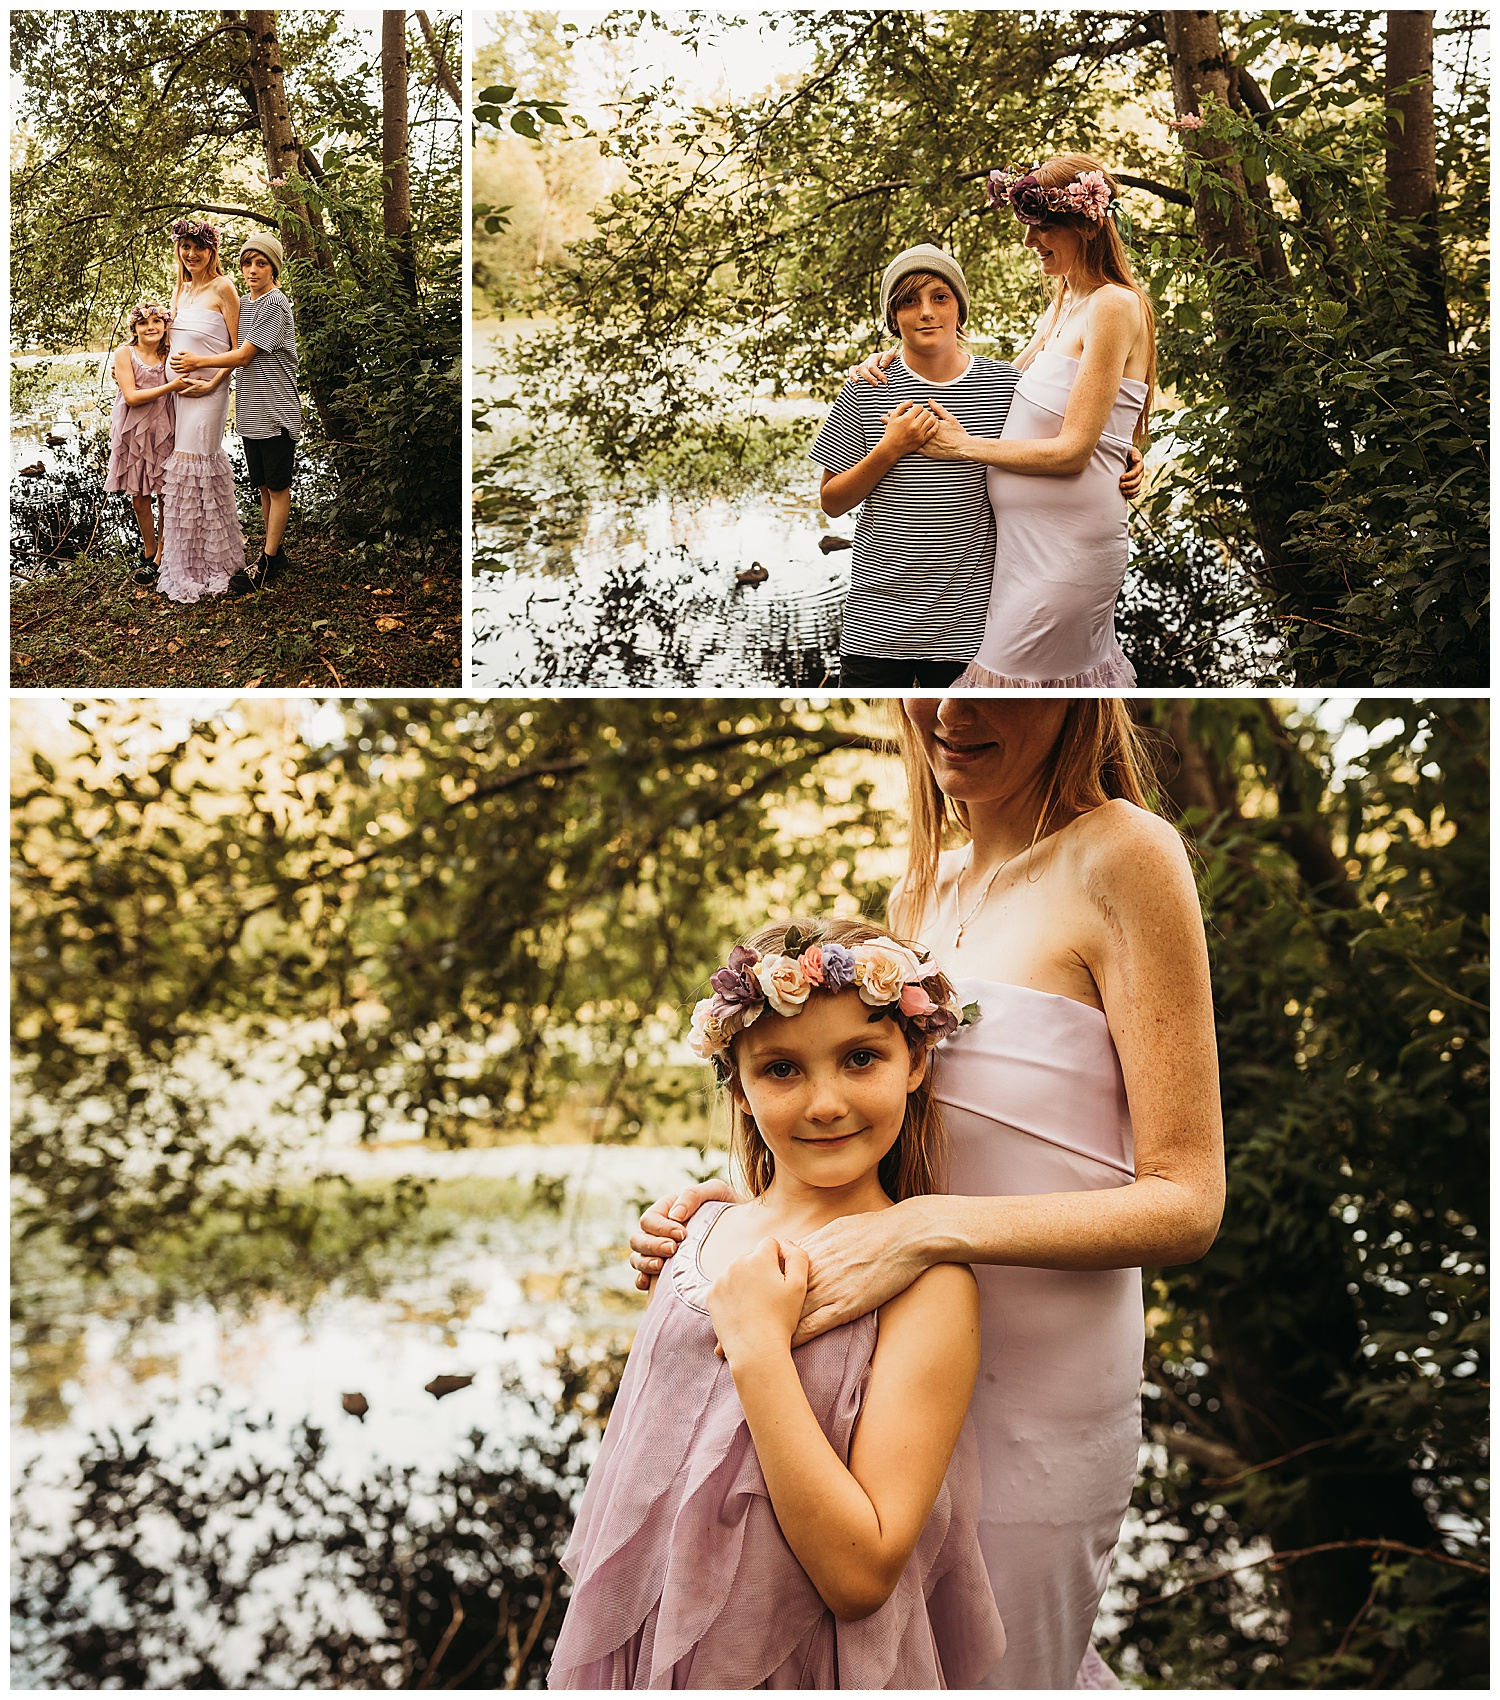 Abbotsford Maternity Anna Hurley Photography 19.jpg